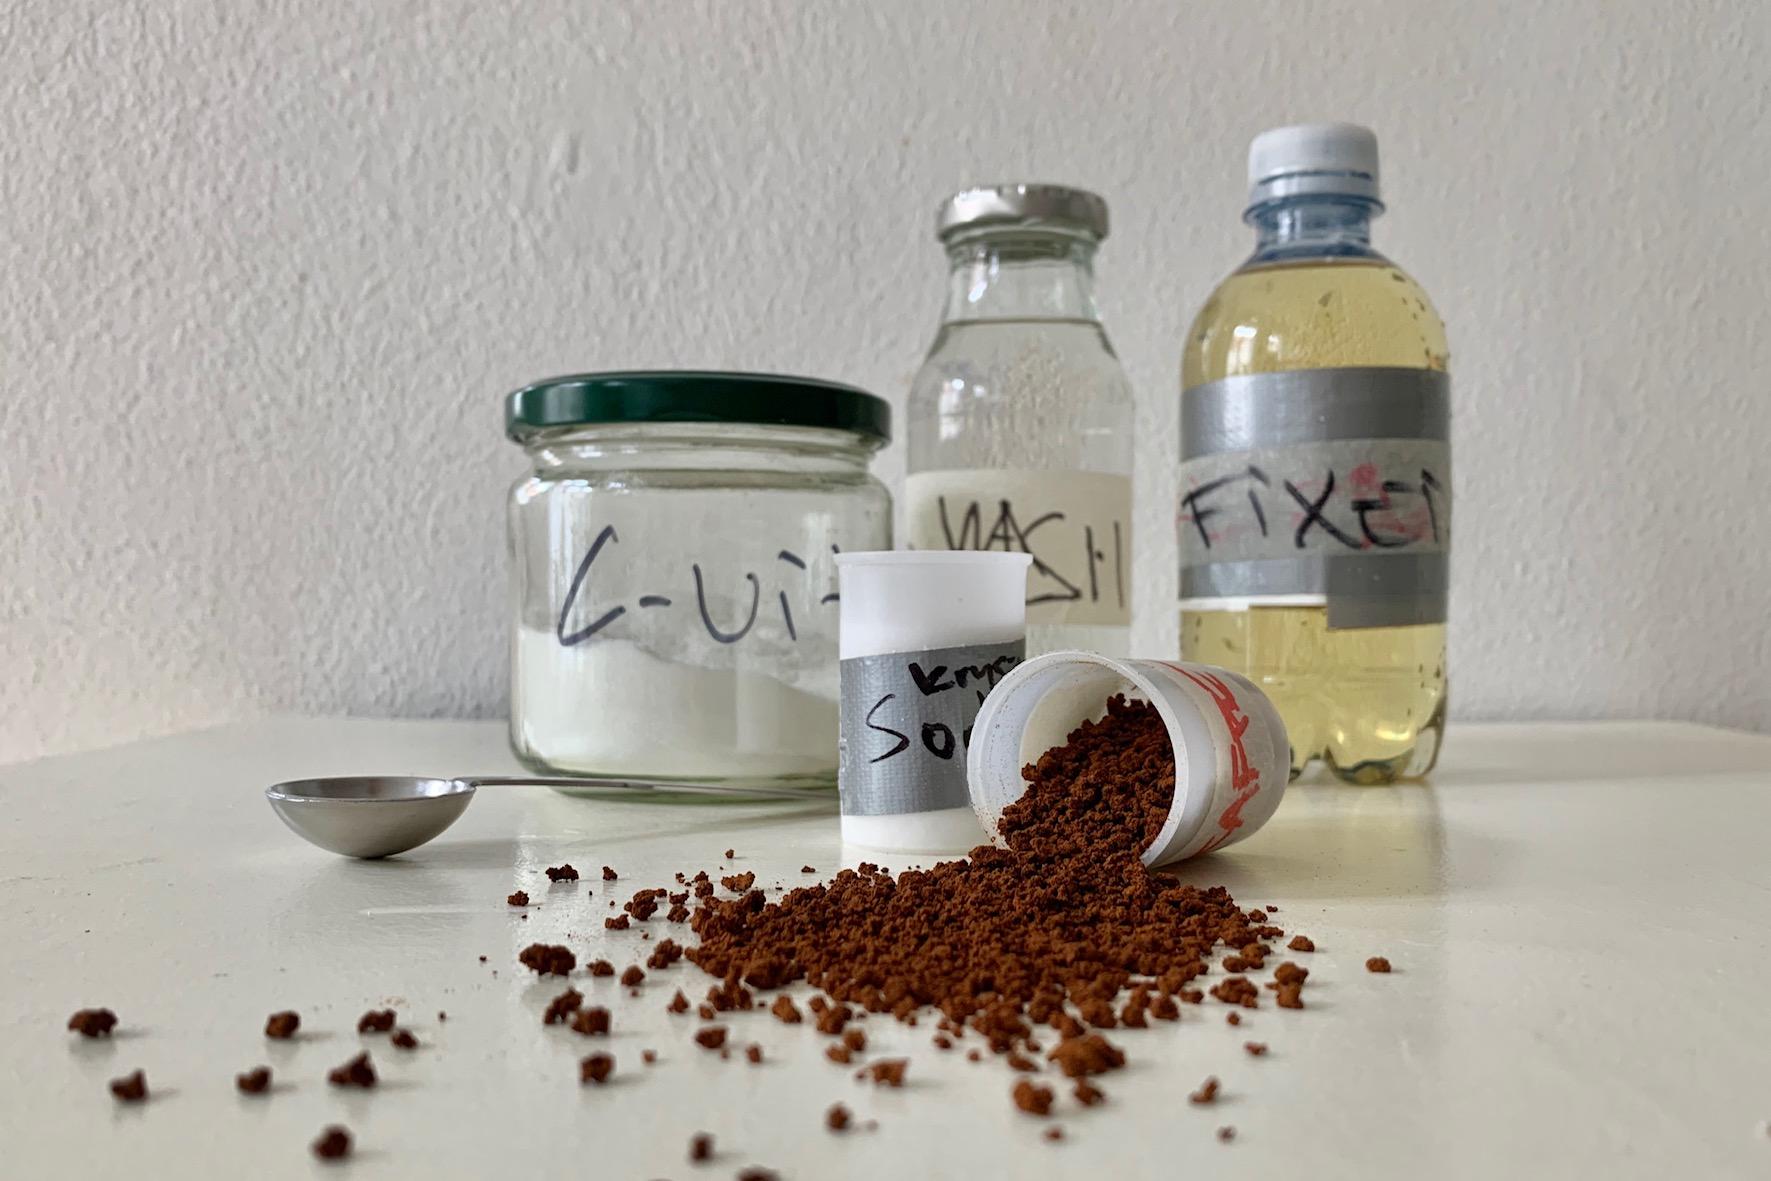 My basic caffenol recipe pr 1000 ml: 100 ml instant coffee, 100 ml crystal soda (only 40ml if water free soda is used), 20ml c-vitamin, 20 ml salt (ionated) . 11-15 min. at 20 celcius. See full recipe below.